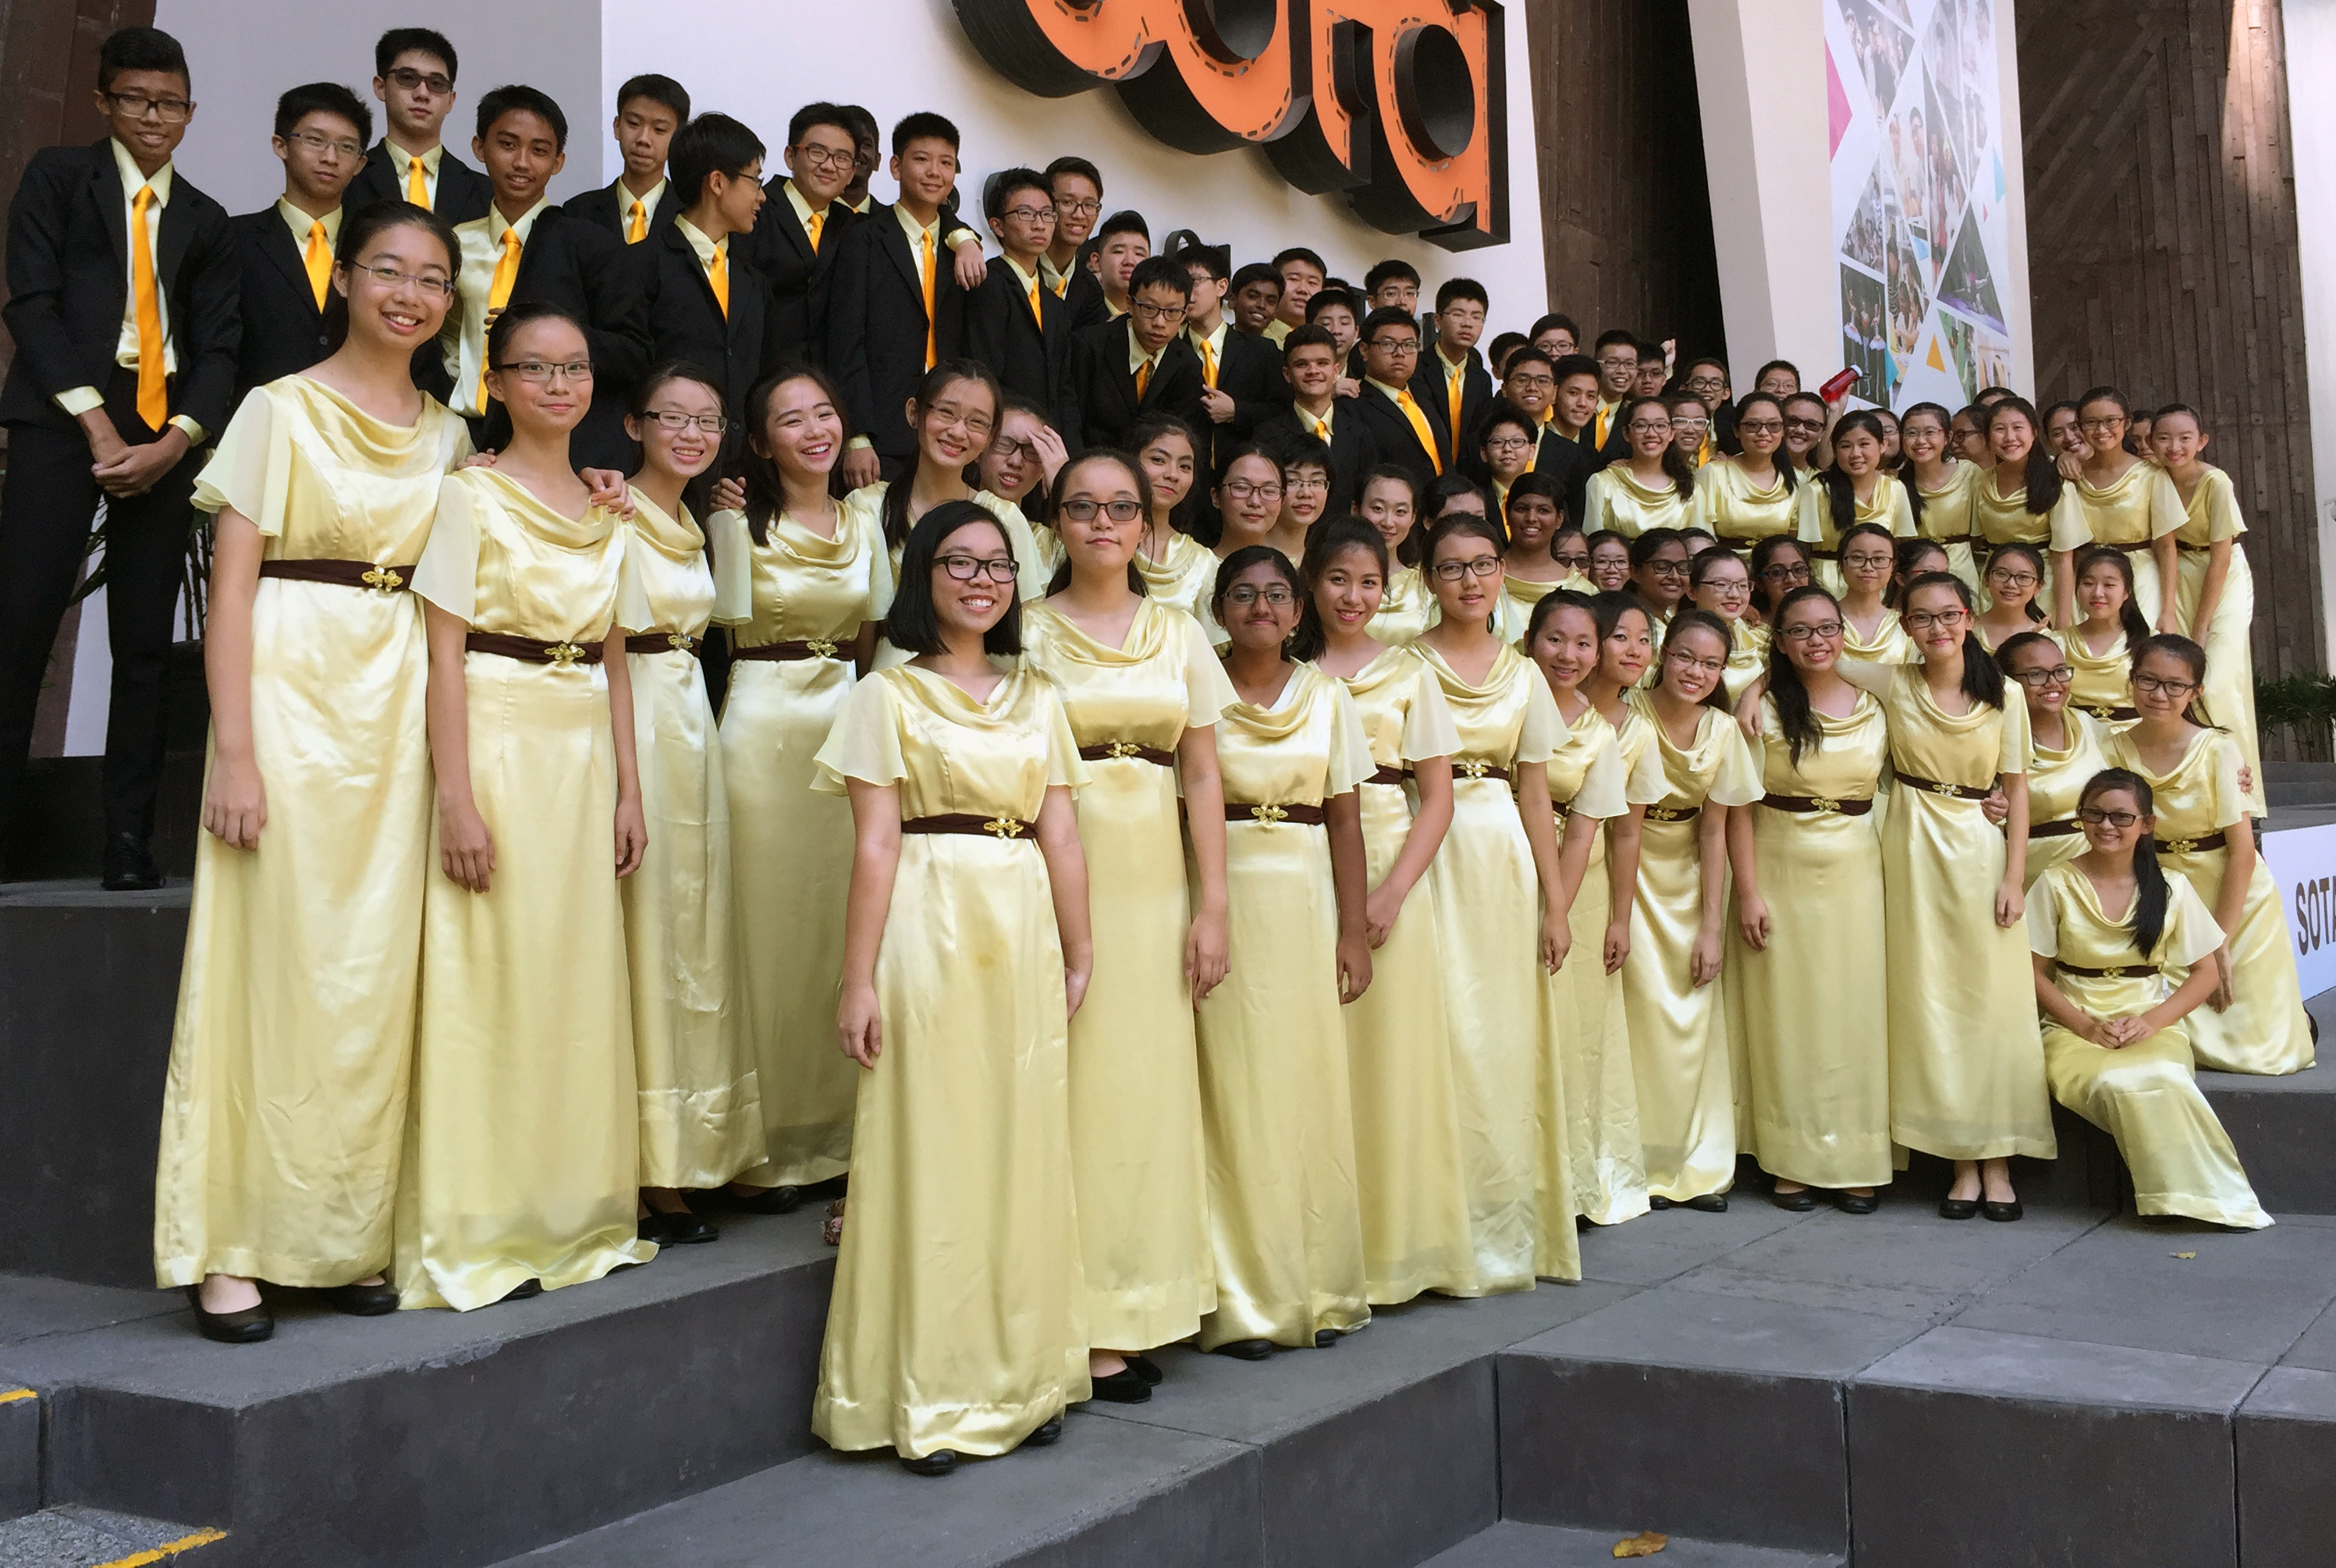 Commonwealth Secondary School Choir